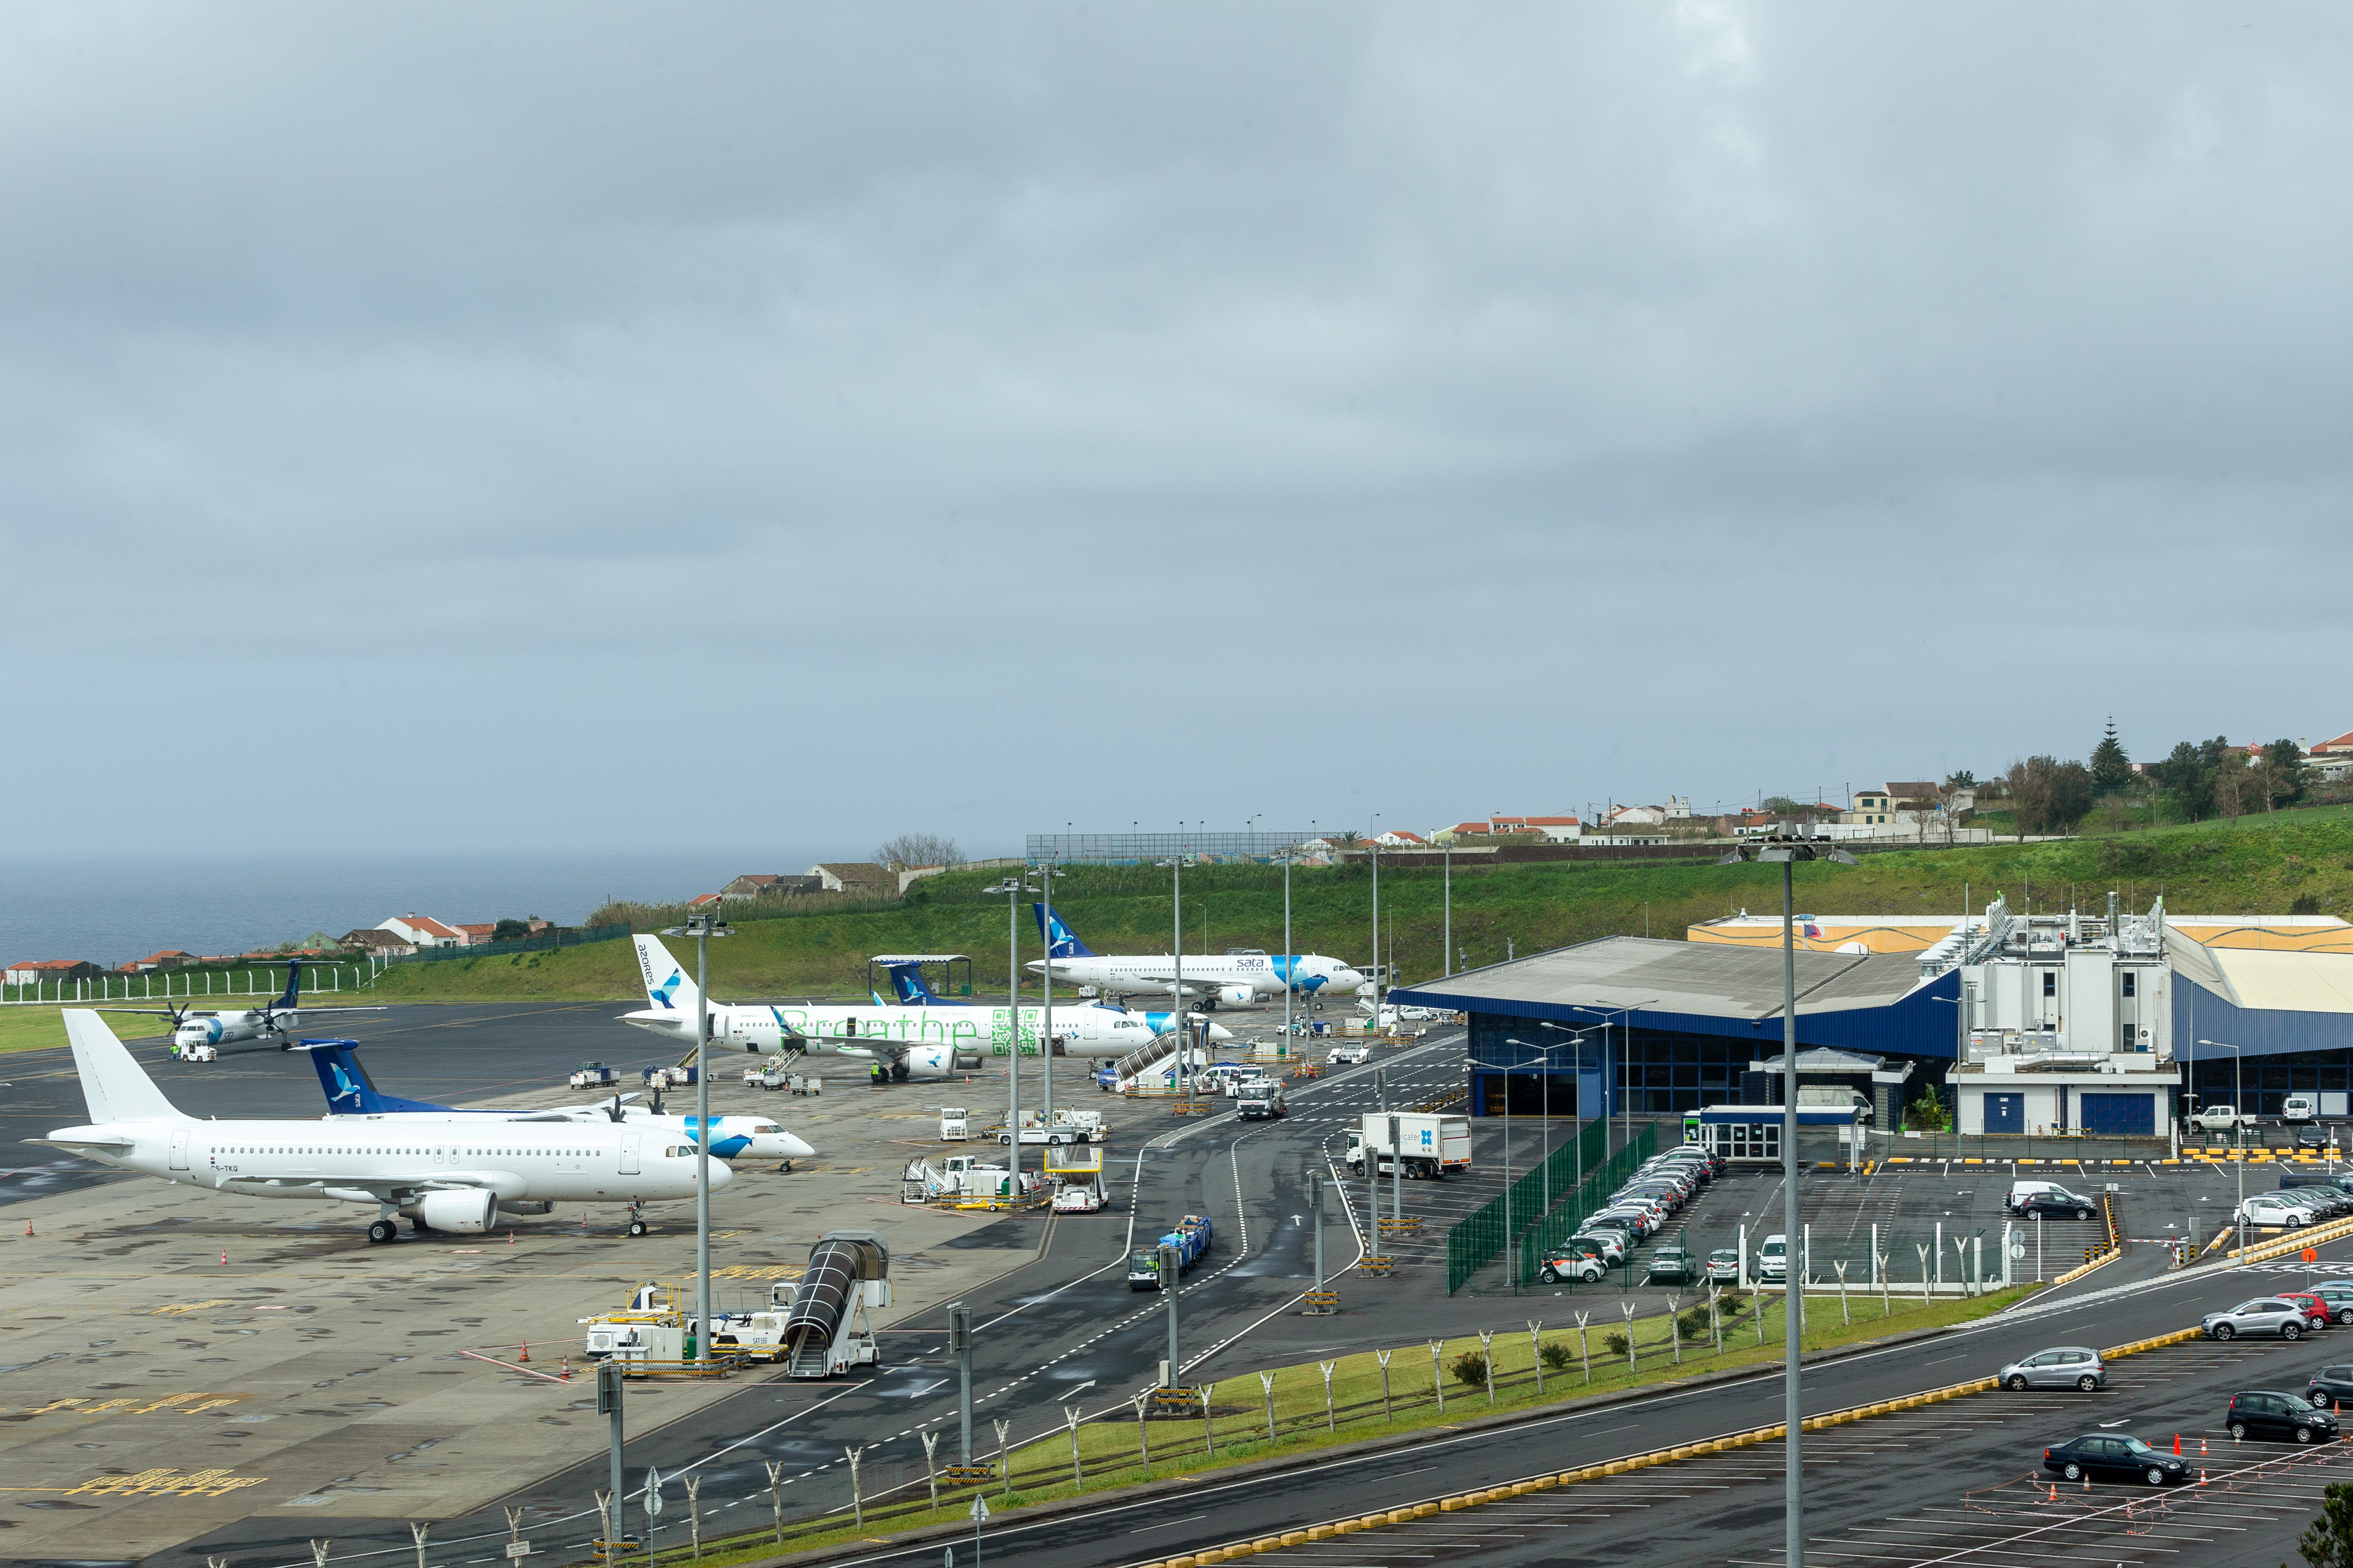 Homem infetado detido no aeroporto de Ponta Delgada